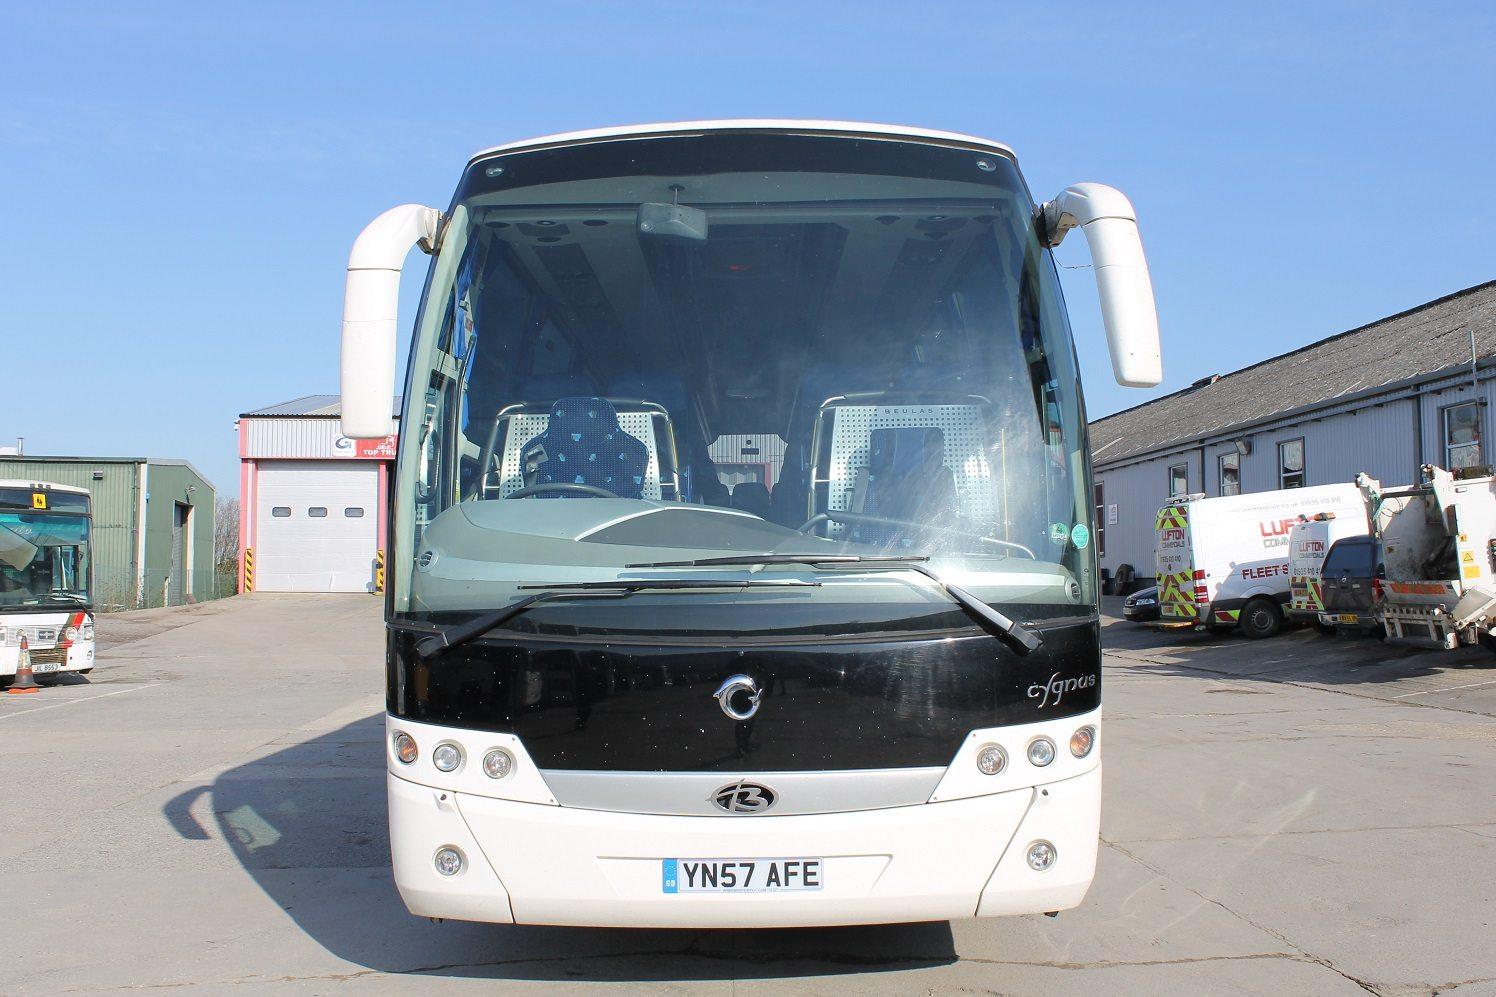 07 Irisbus C45 Beulas Cygnus 53 Seats Hills Coaches